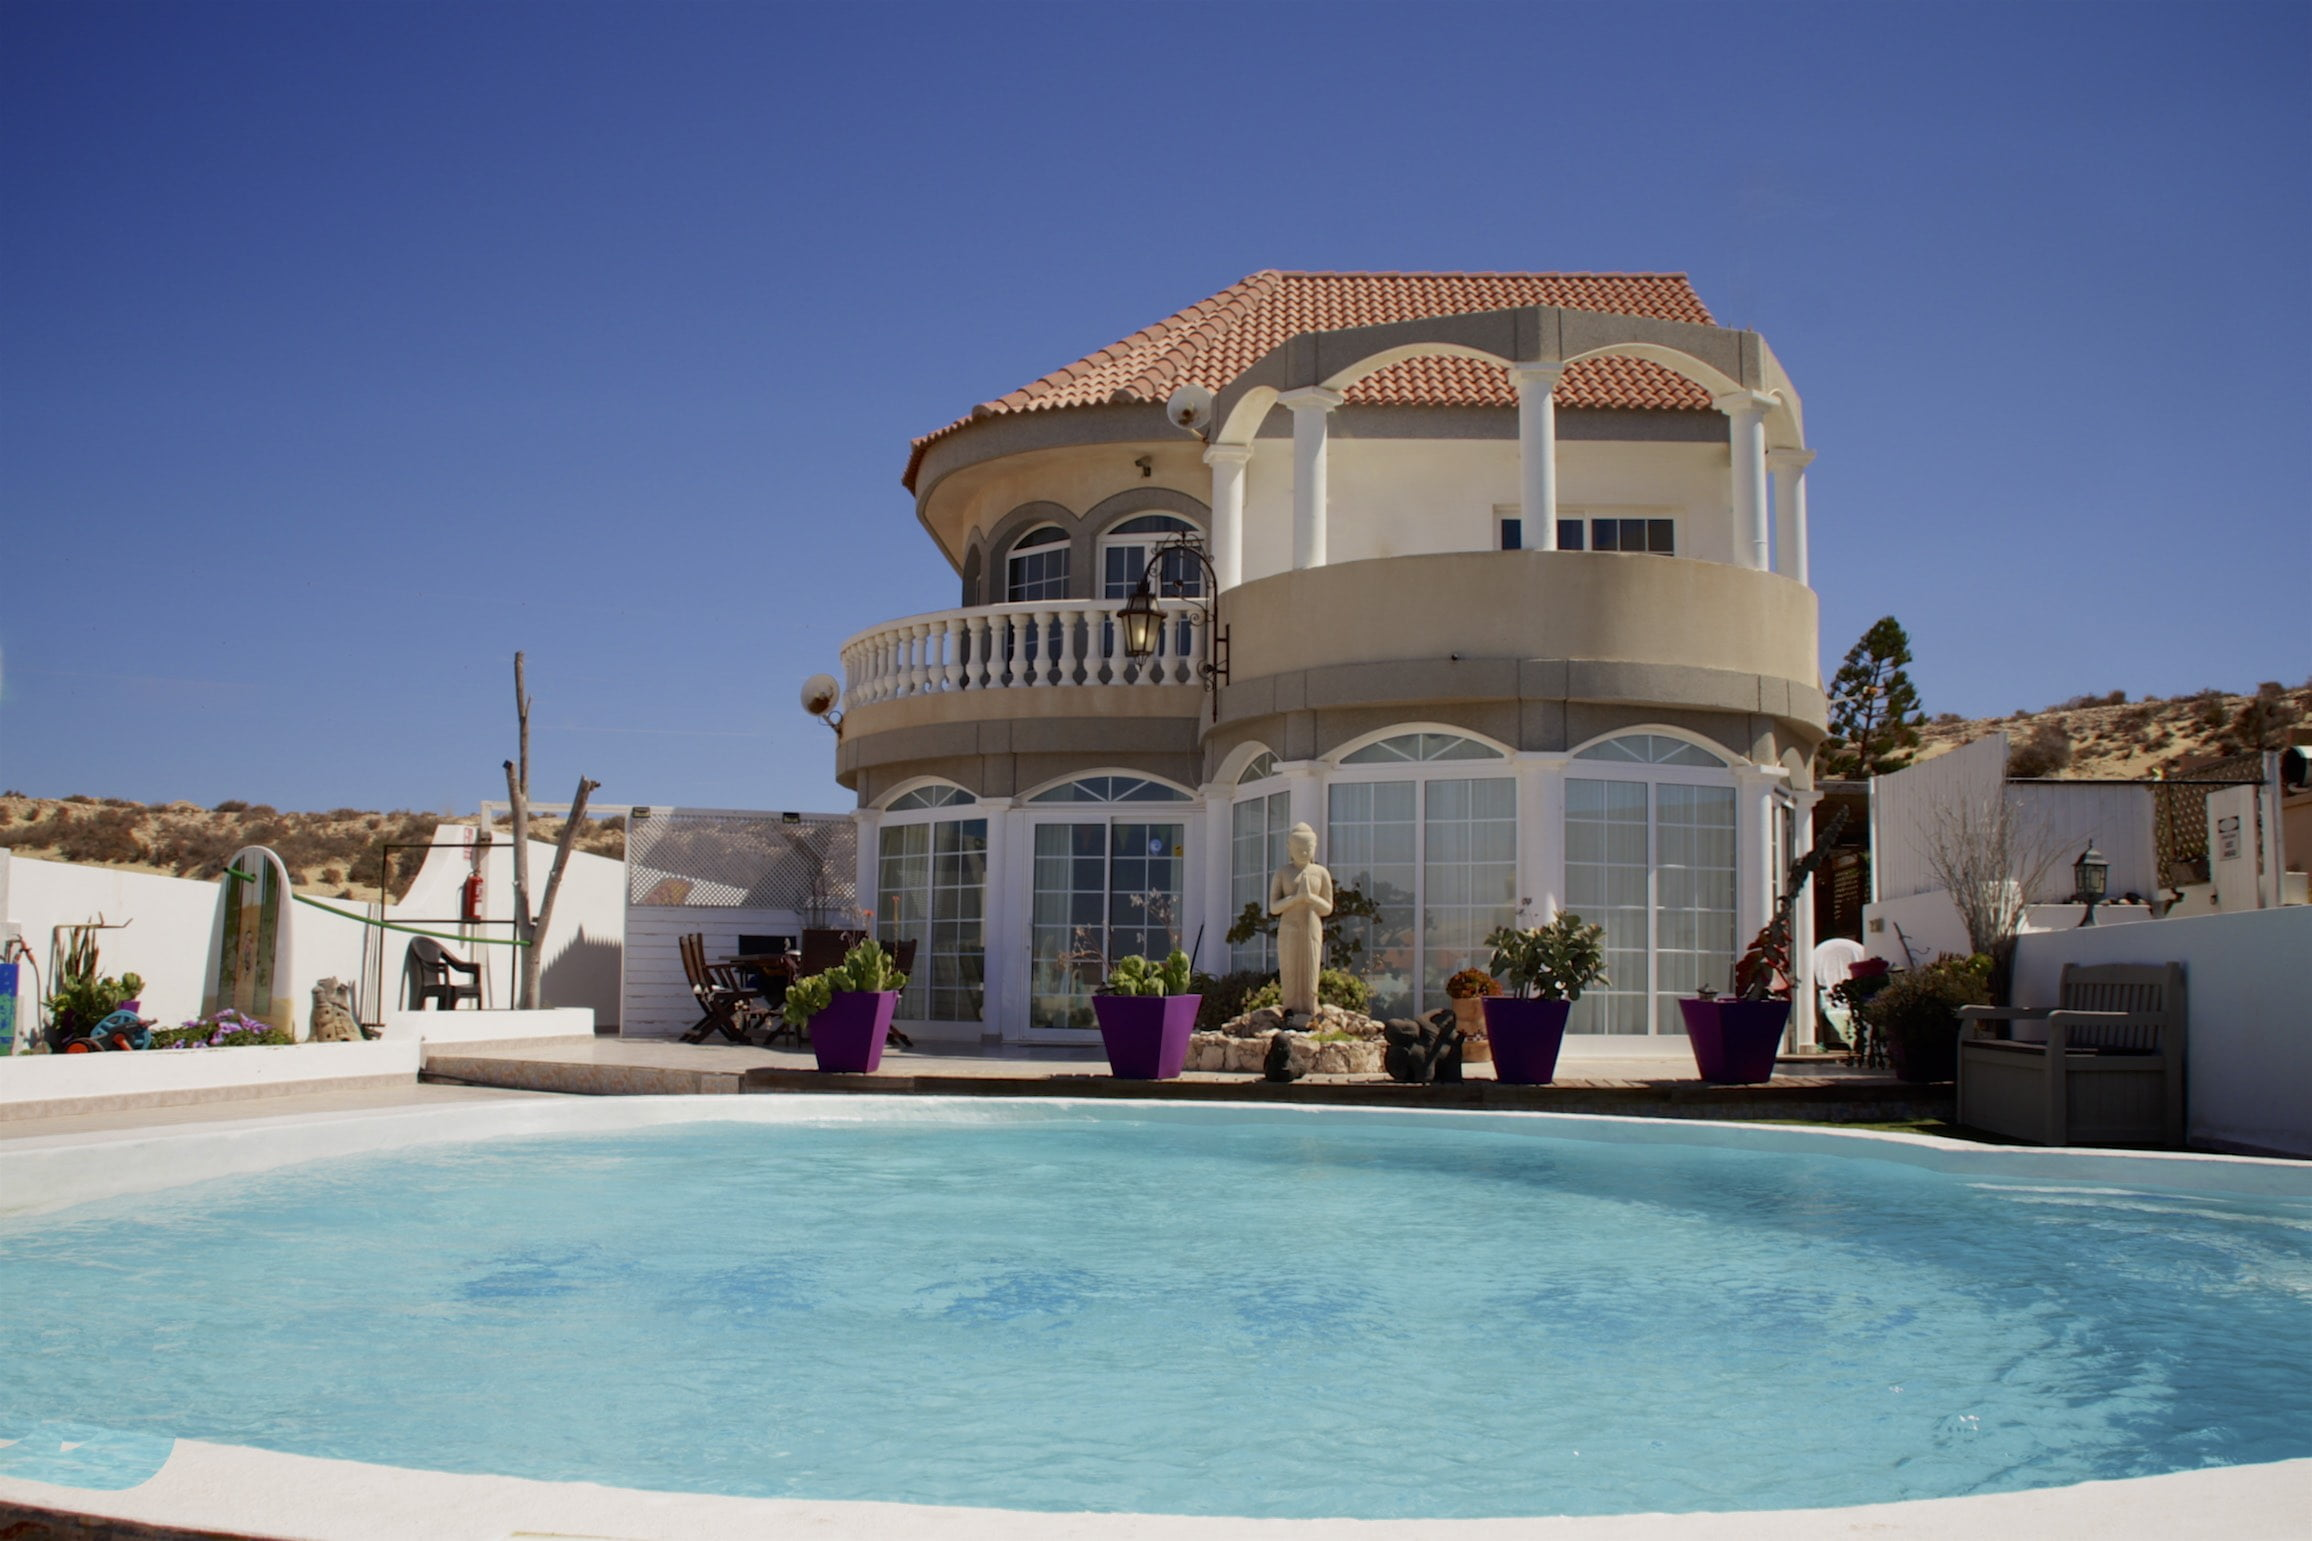 Entresalas - Big expat villa on Fuerteventura